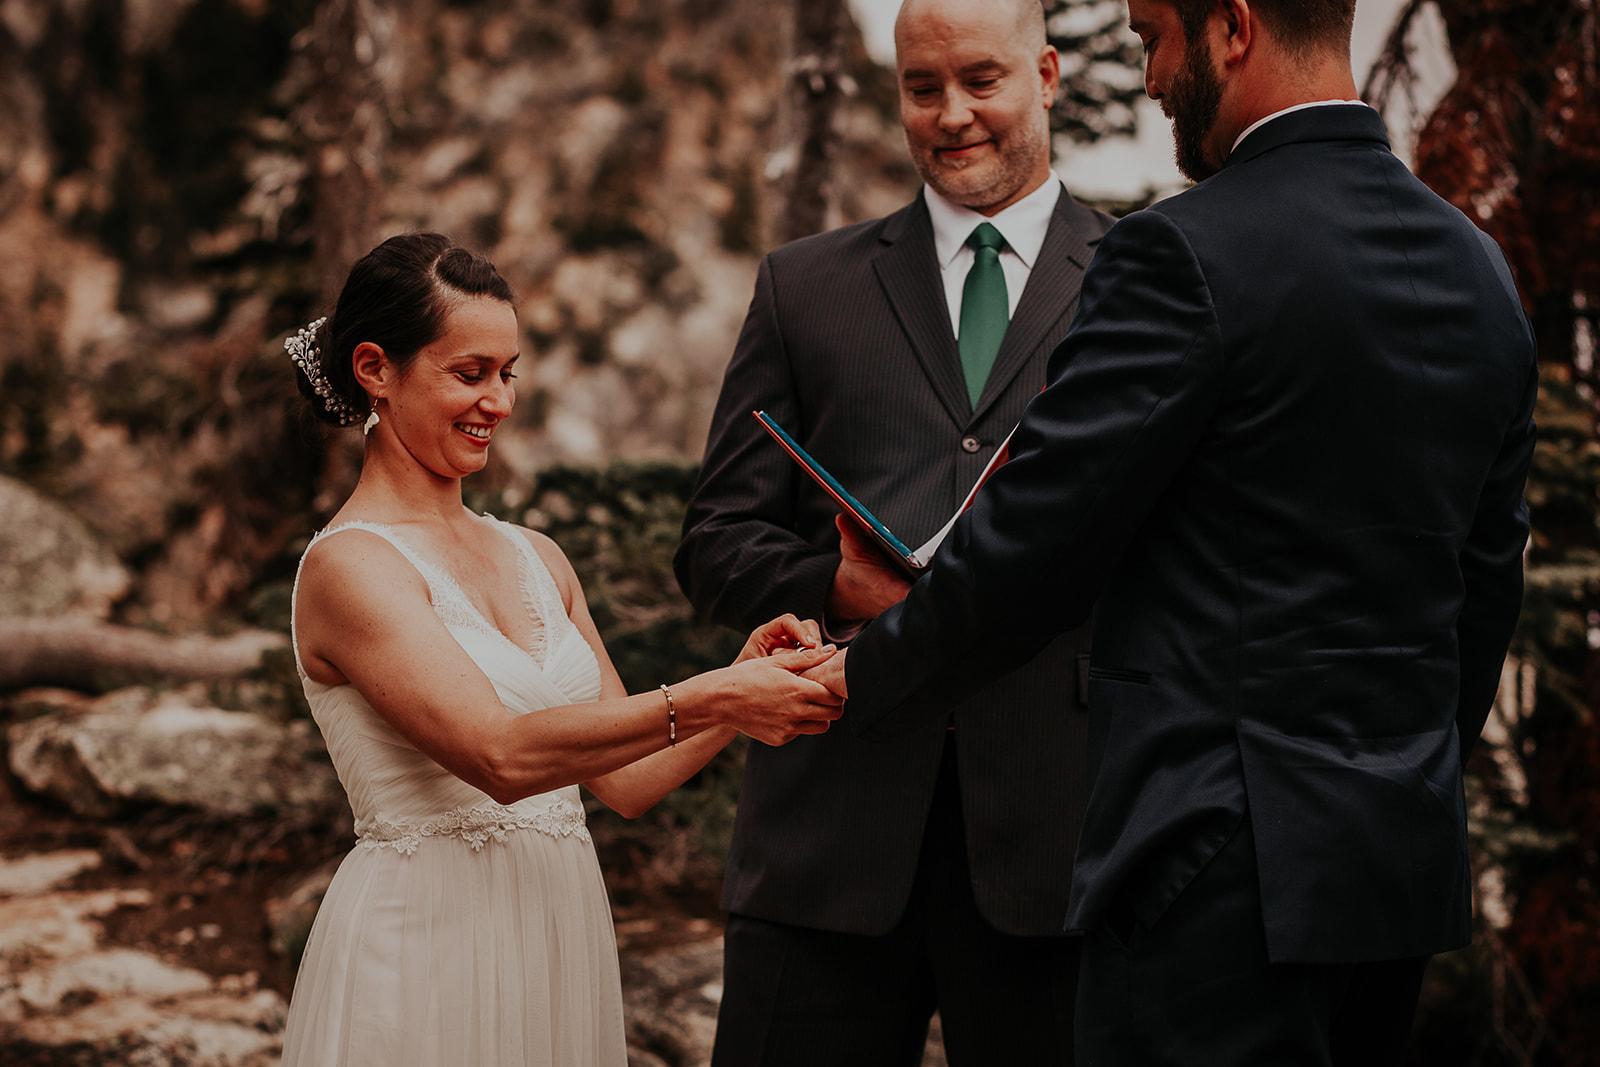 winthrop-wedding-photographer-megan-gallagher-photography (22).jpg